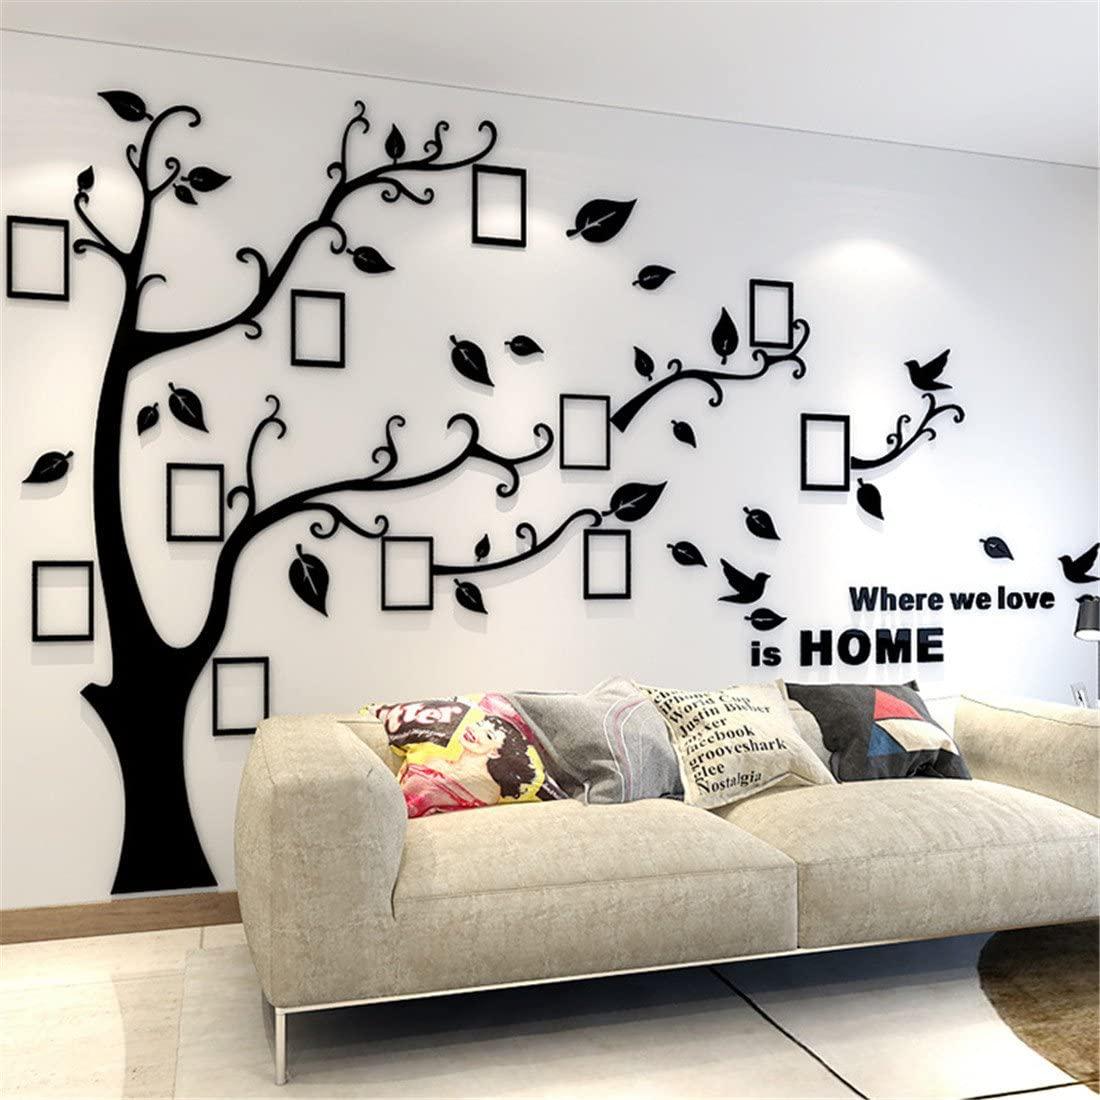 Idee X Decorare Pareti idee per decorare pareti con fotografie